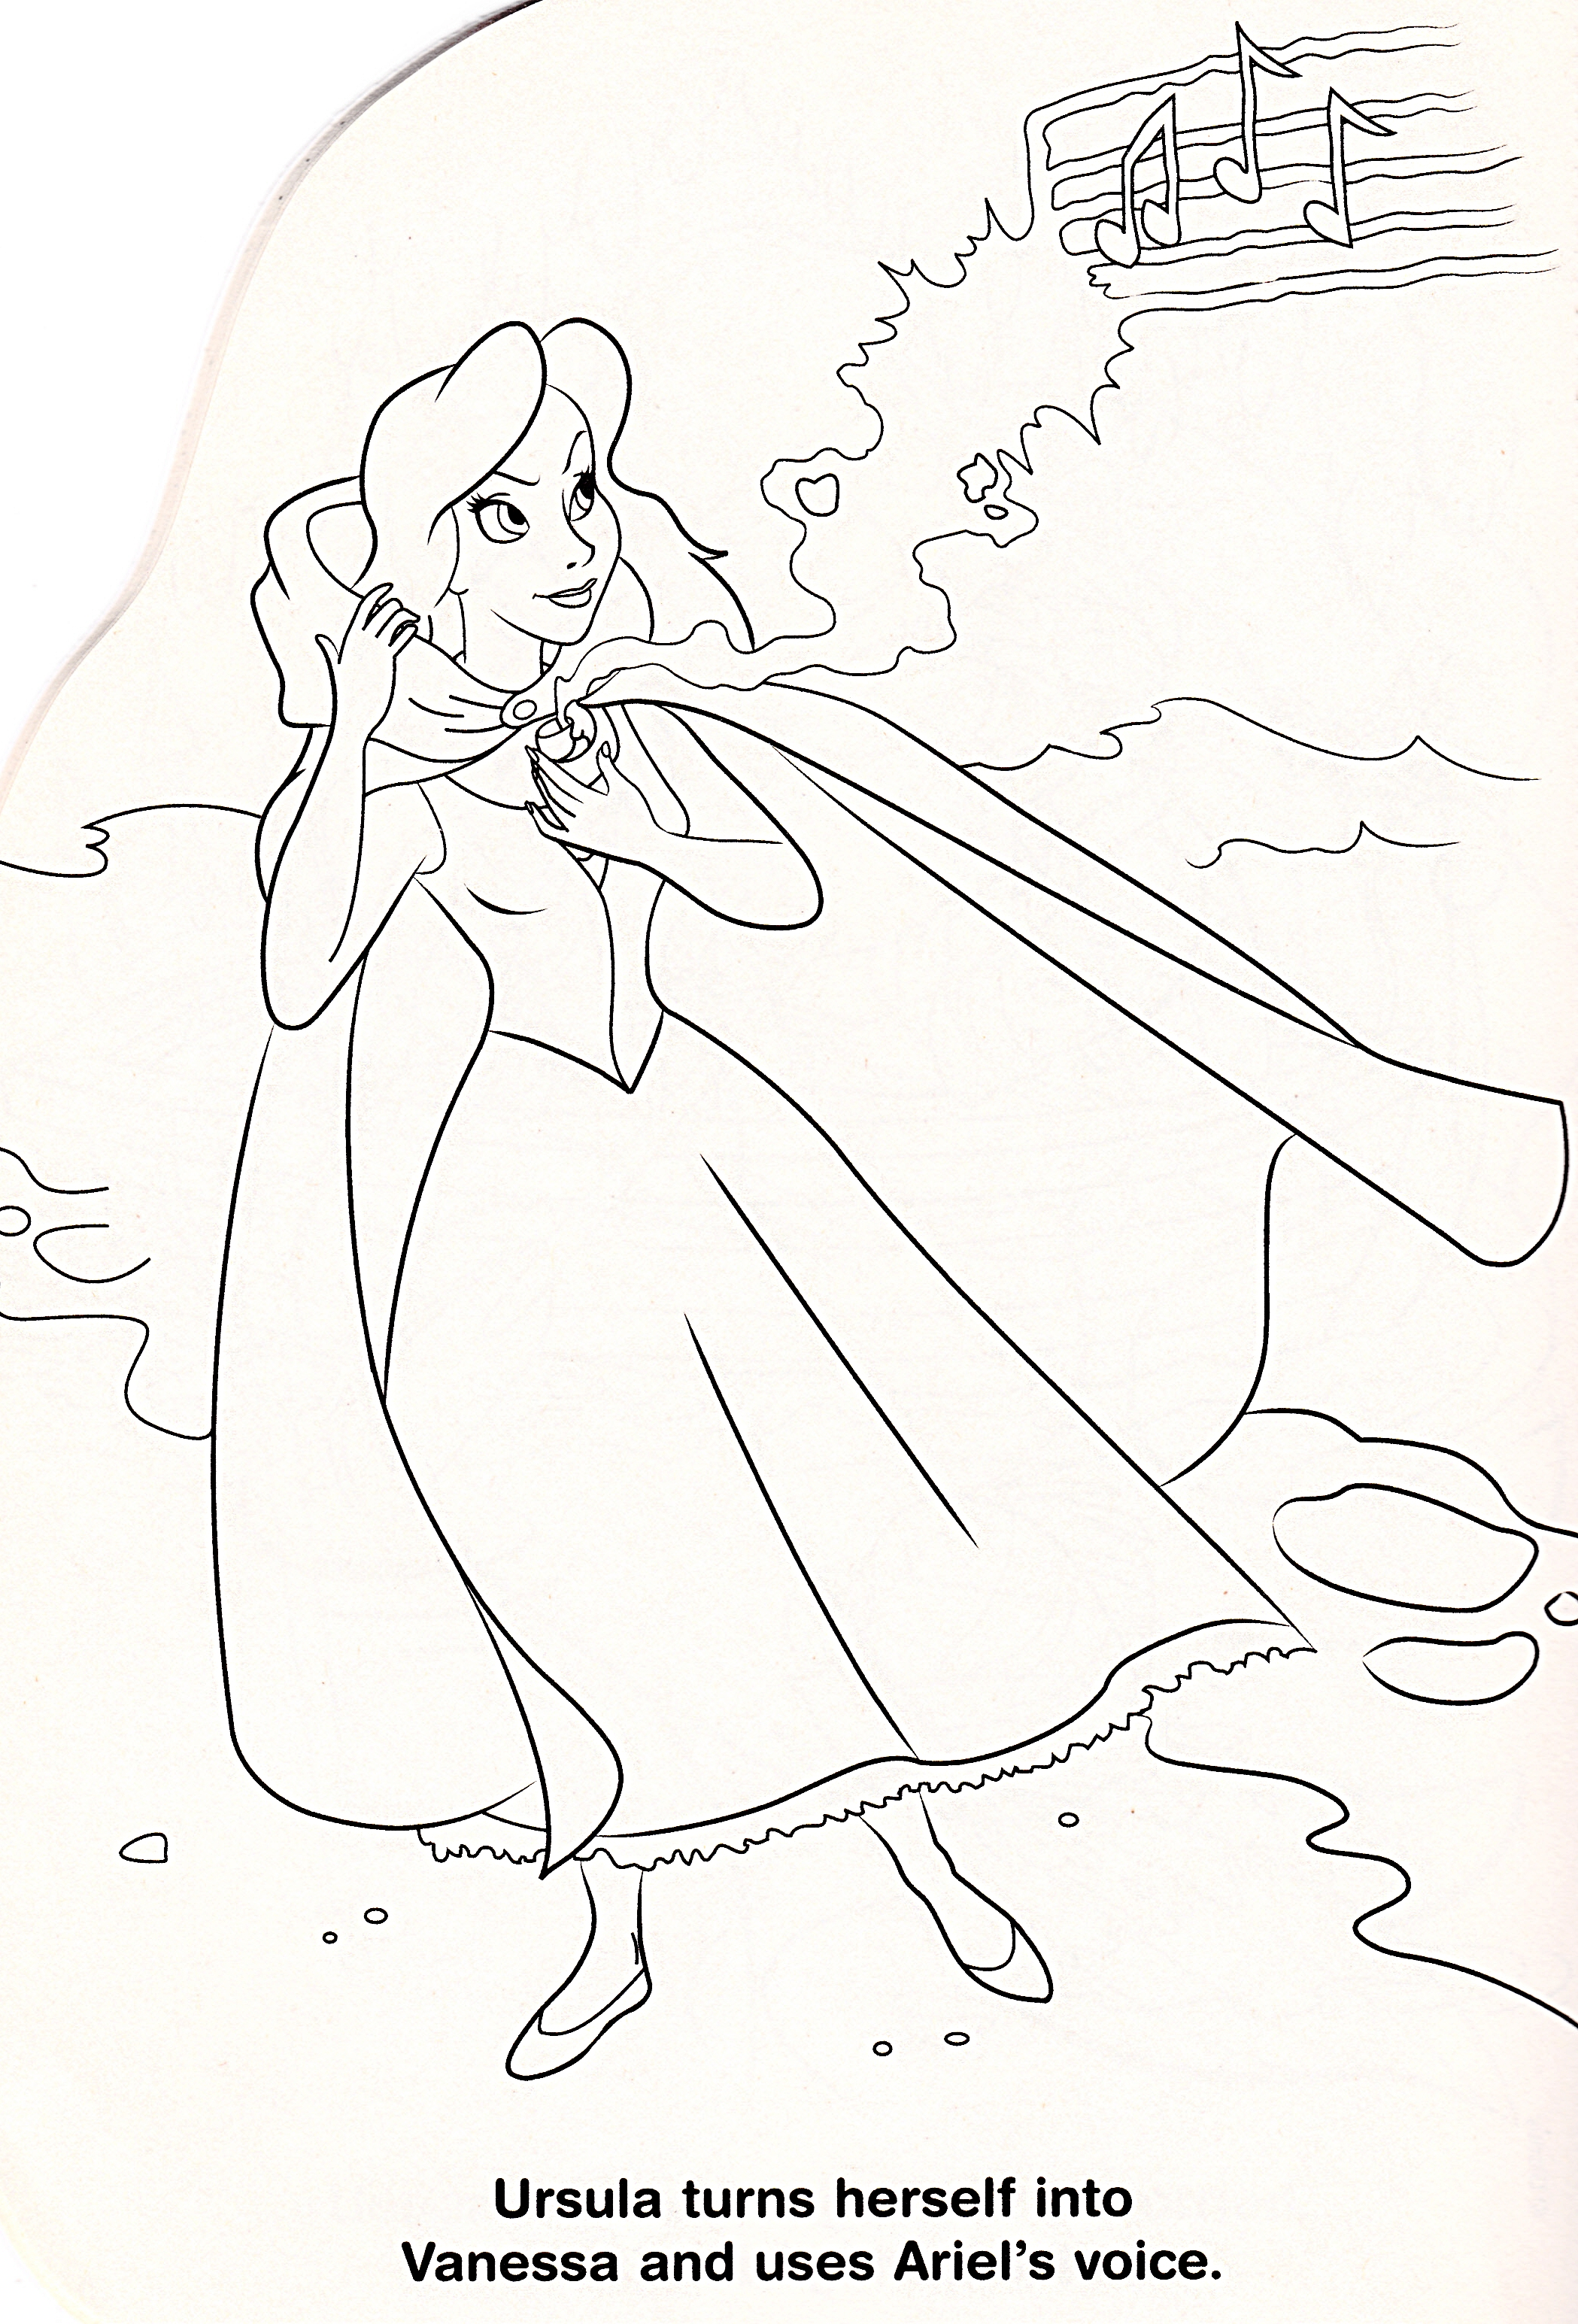 walt disney coloring pages - vanessa